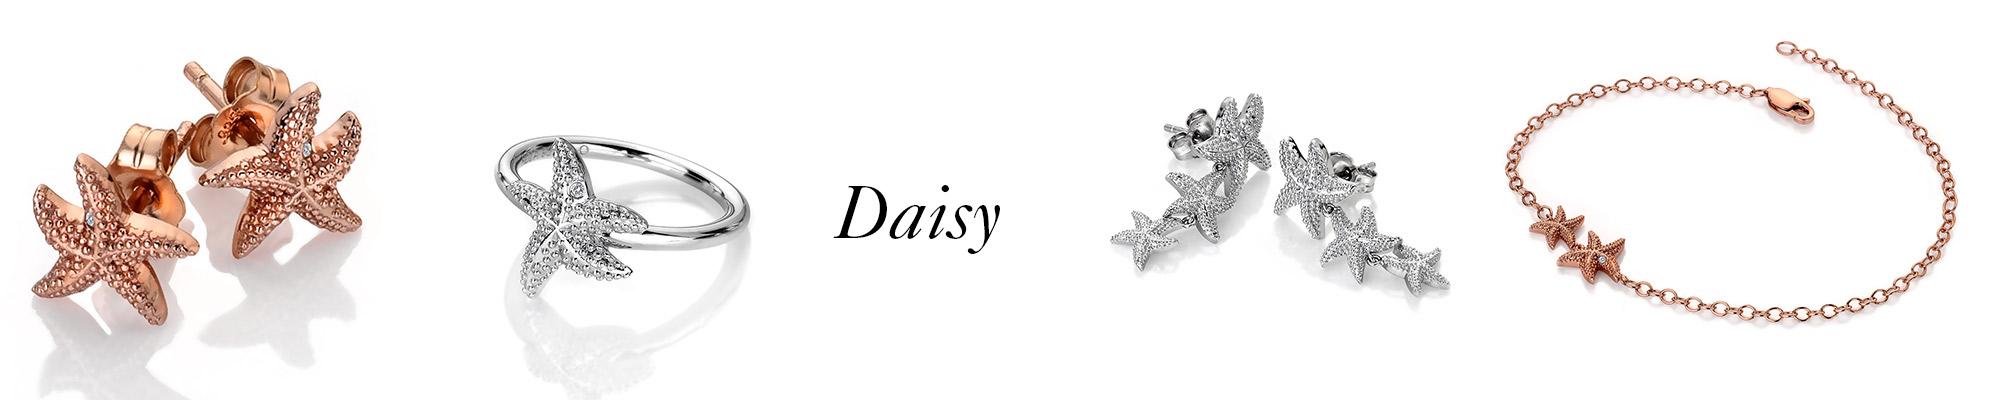 kolekce Daisy